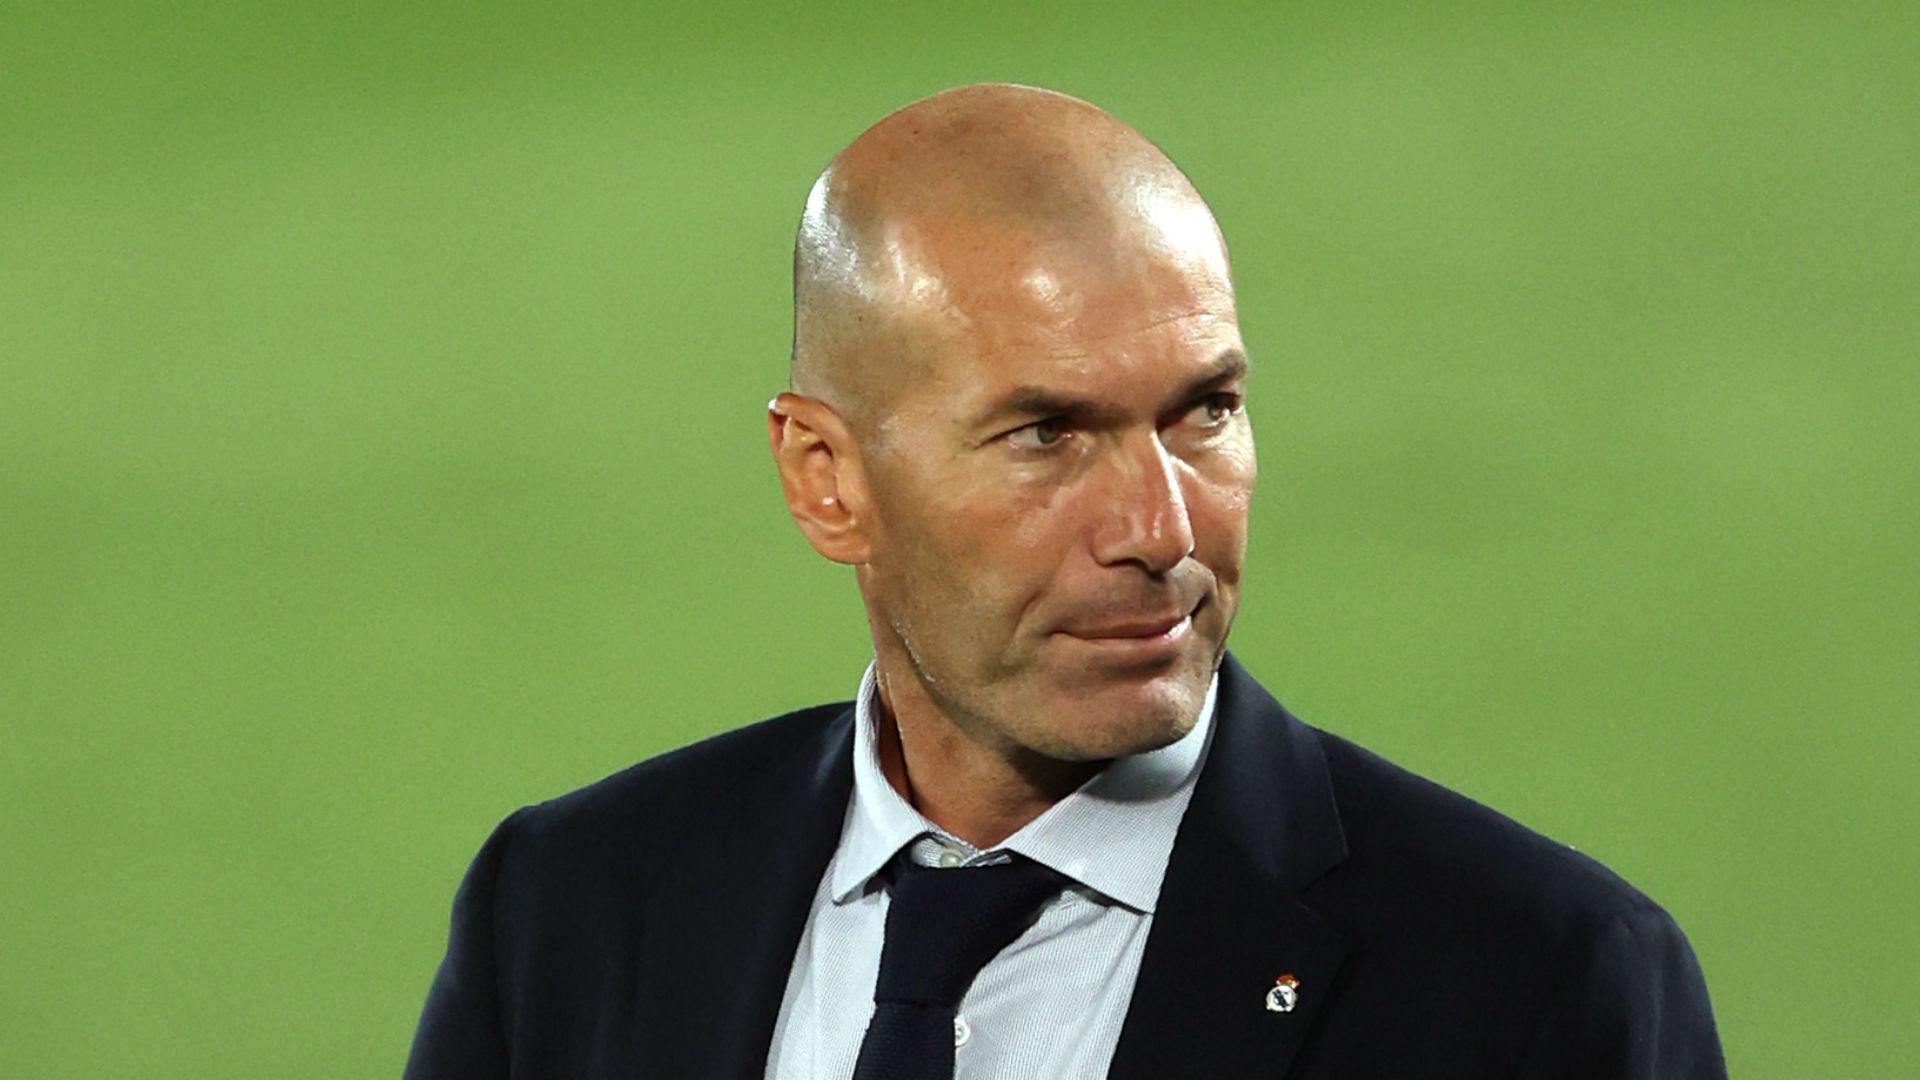 Will I still be at Madrid next season? No one knows the future, says Zidane